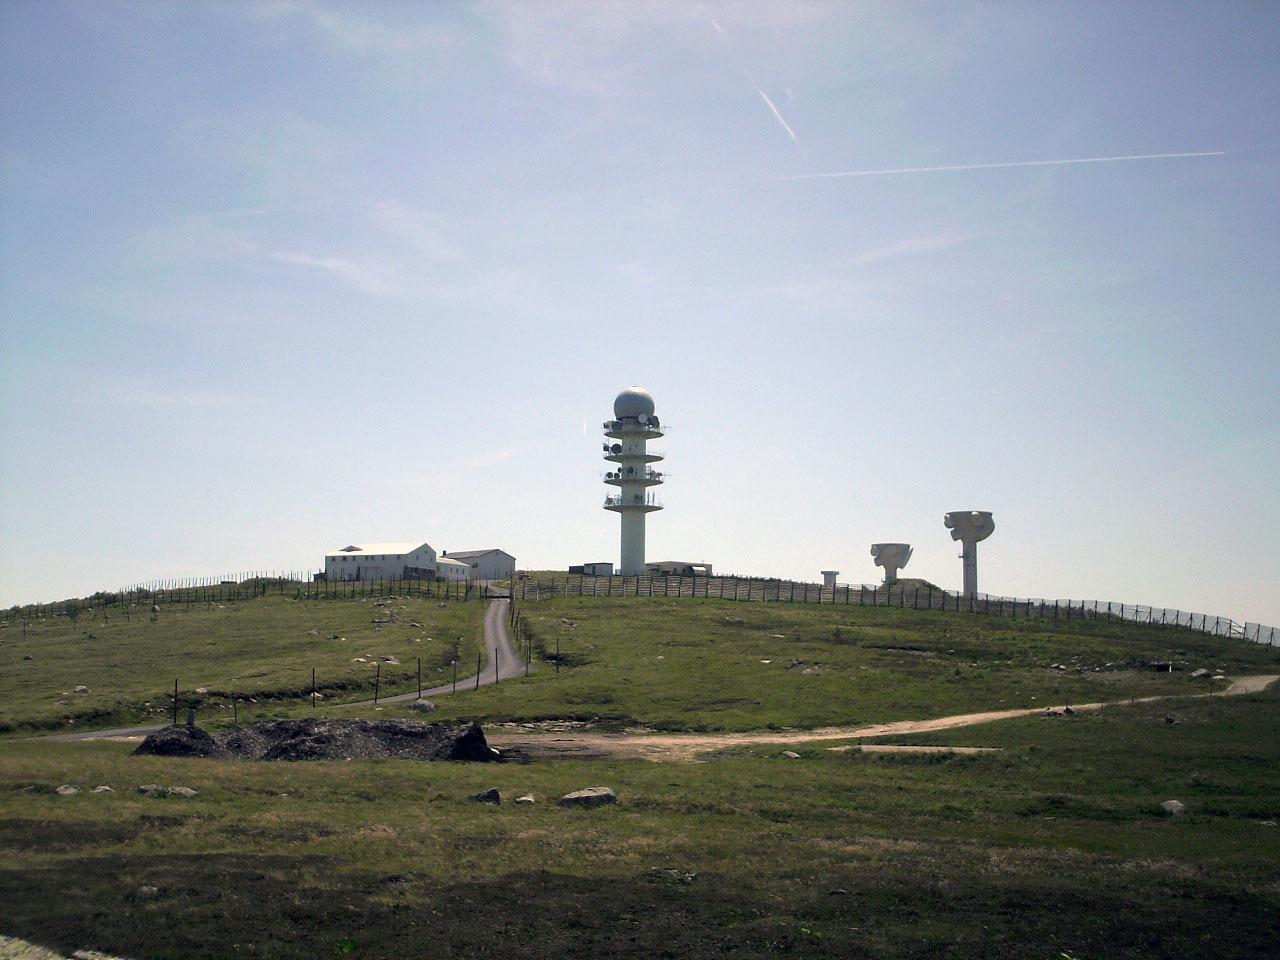 Milit rische funkstation pierre sur haute wikipedia for Haute pierre